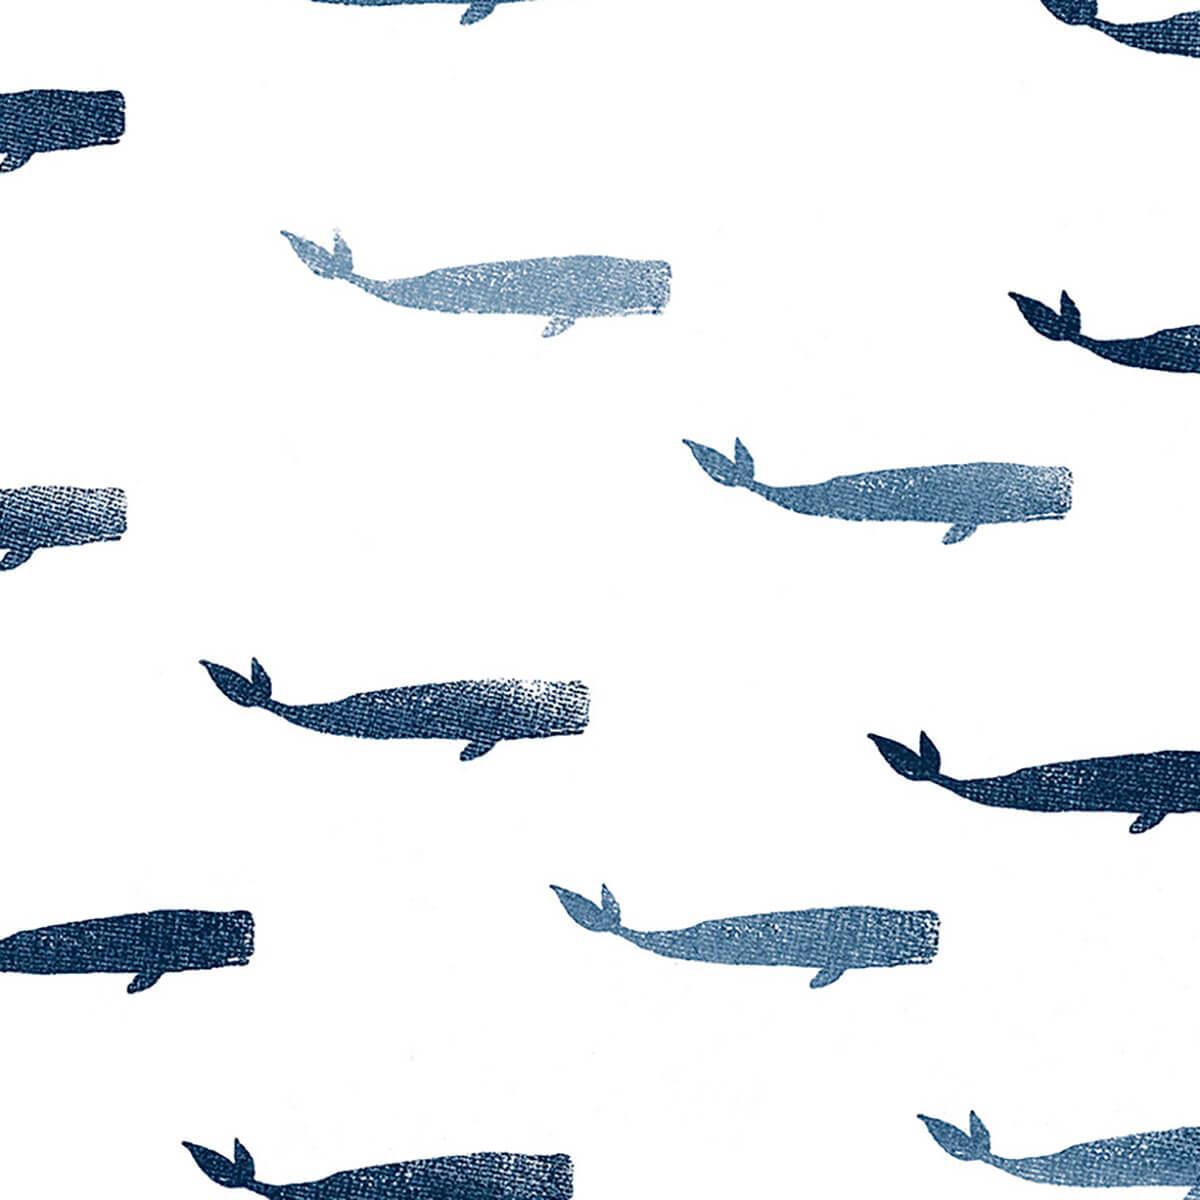 Papel de parede baleia | Estela Miazzi